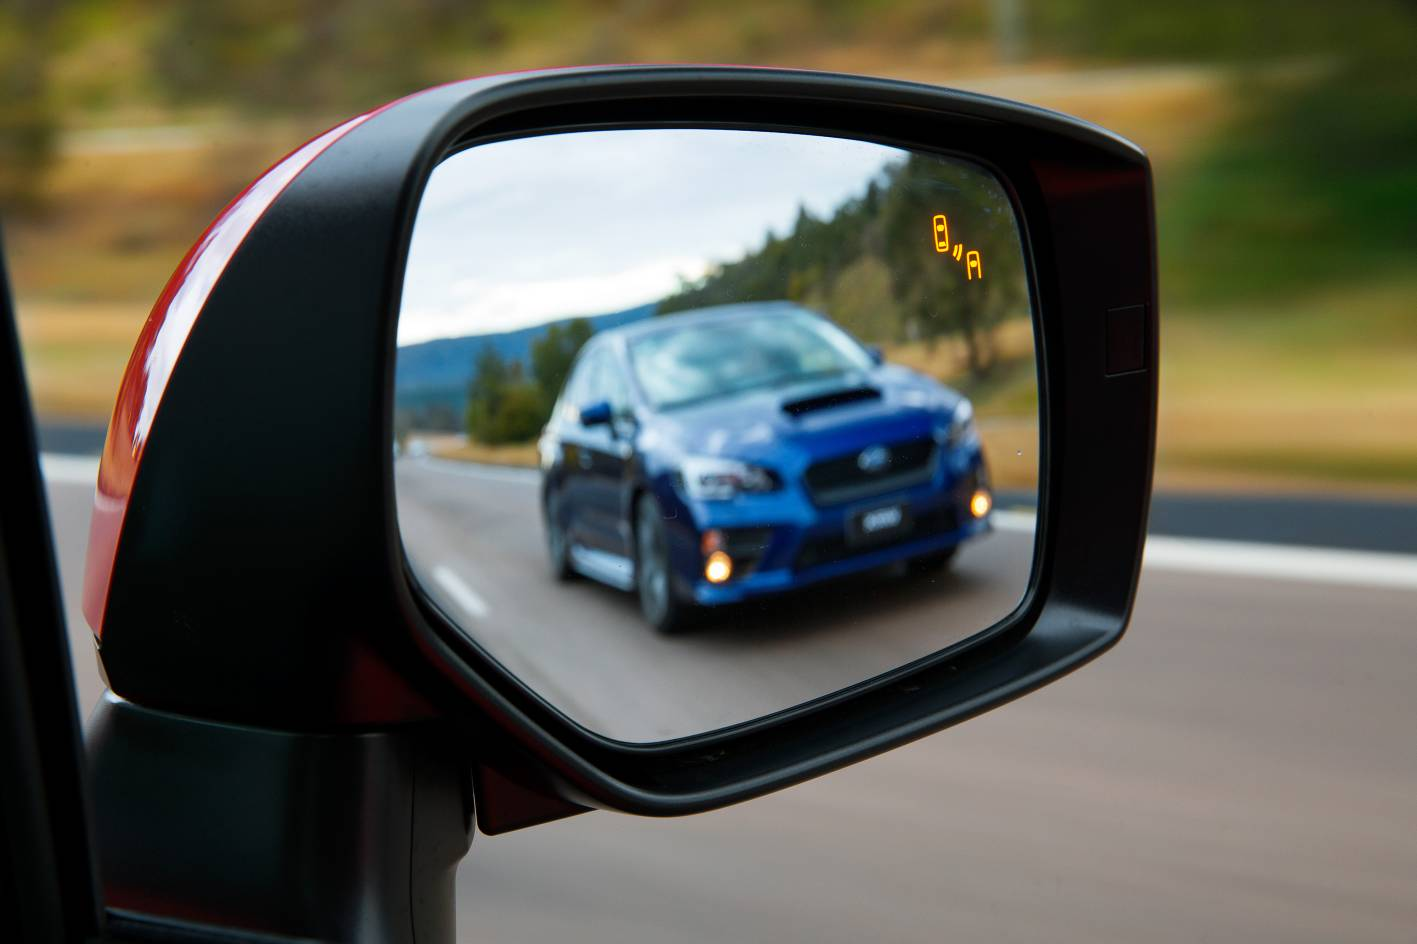 Subaru Boxer Engine >> More gear and price update for 2016 Subaru WRX and WRX STI - ForceGT.com